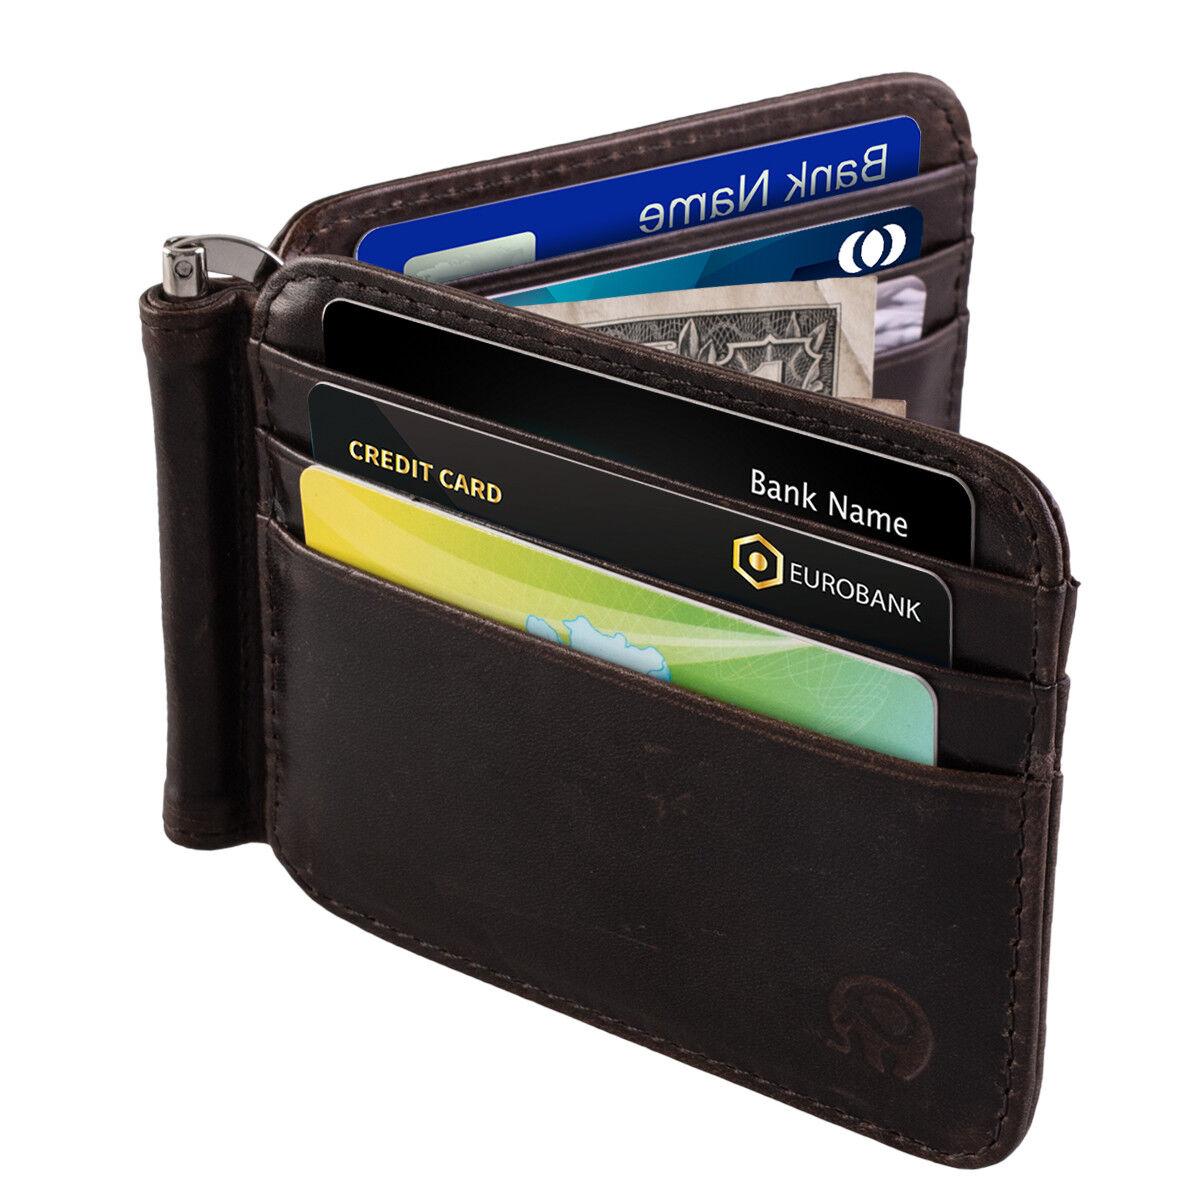 Slim Thin Mens Leather Wallet Money Clip Credit Card ID Holder Front Pocket